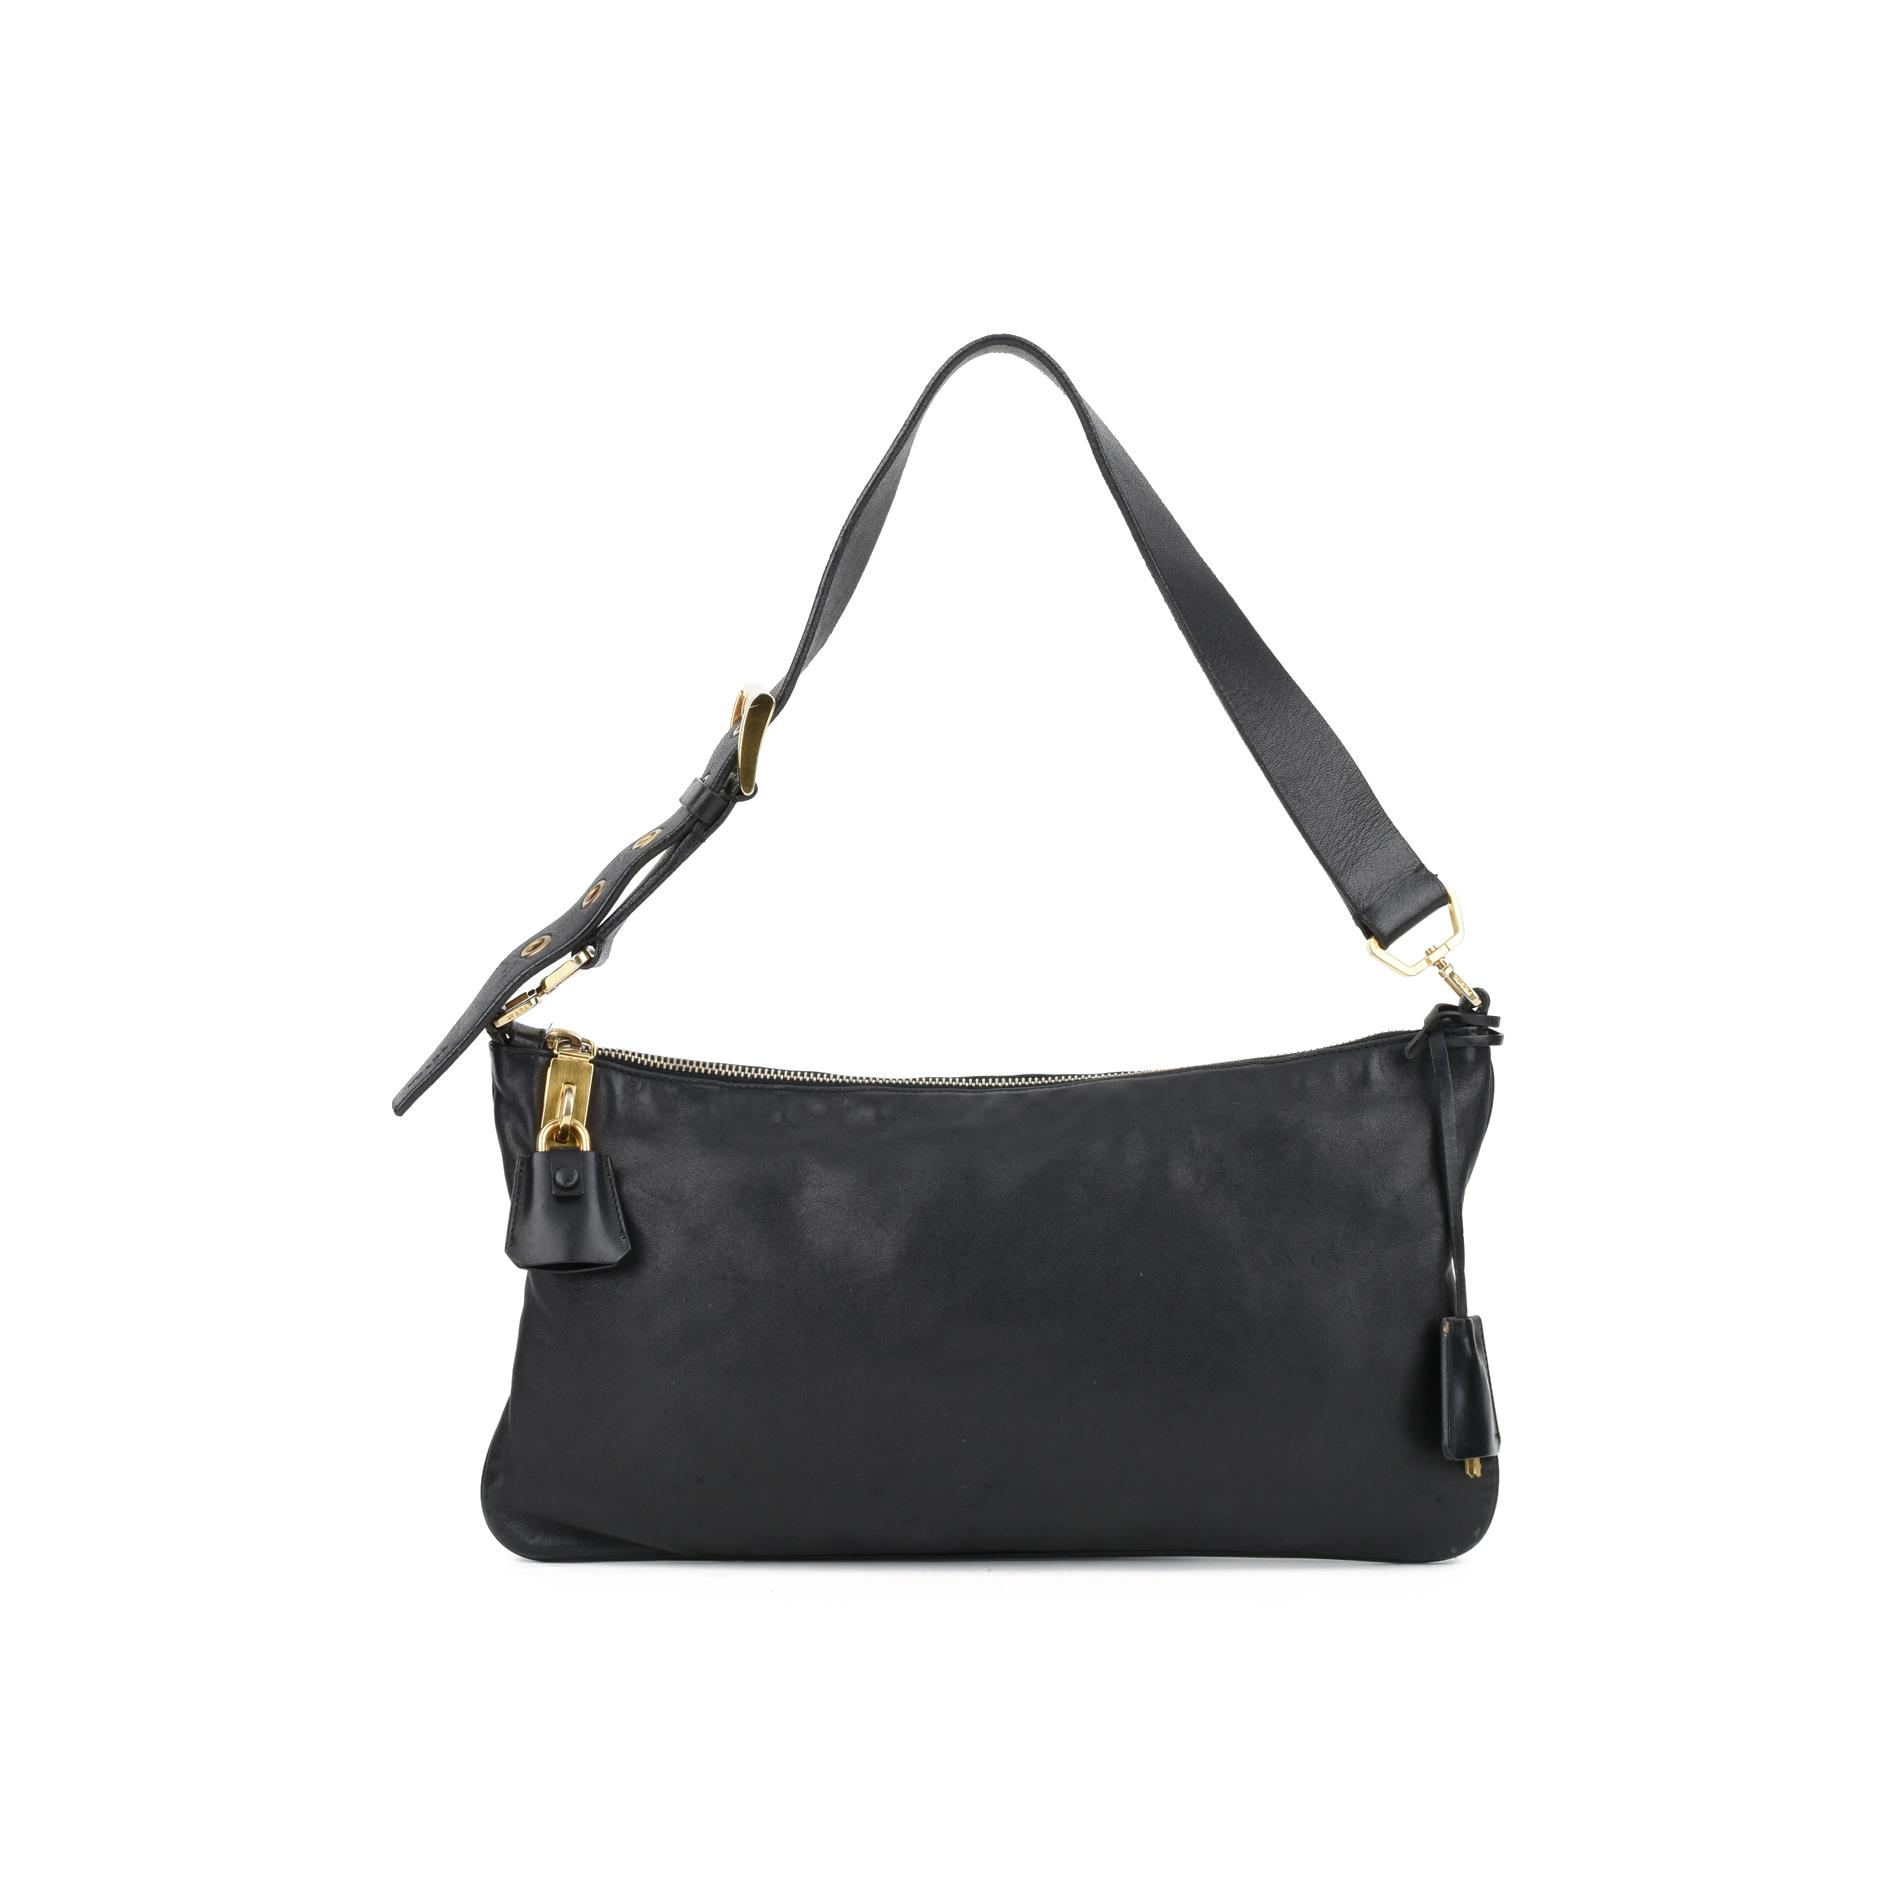 7c8e3318dc77 Authentic Second Hand Prada Lock and Key Shoulder Bag (PSS-126-00053 ...